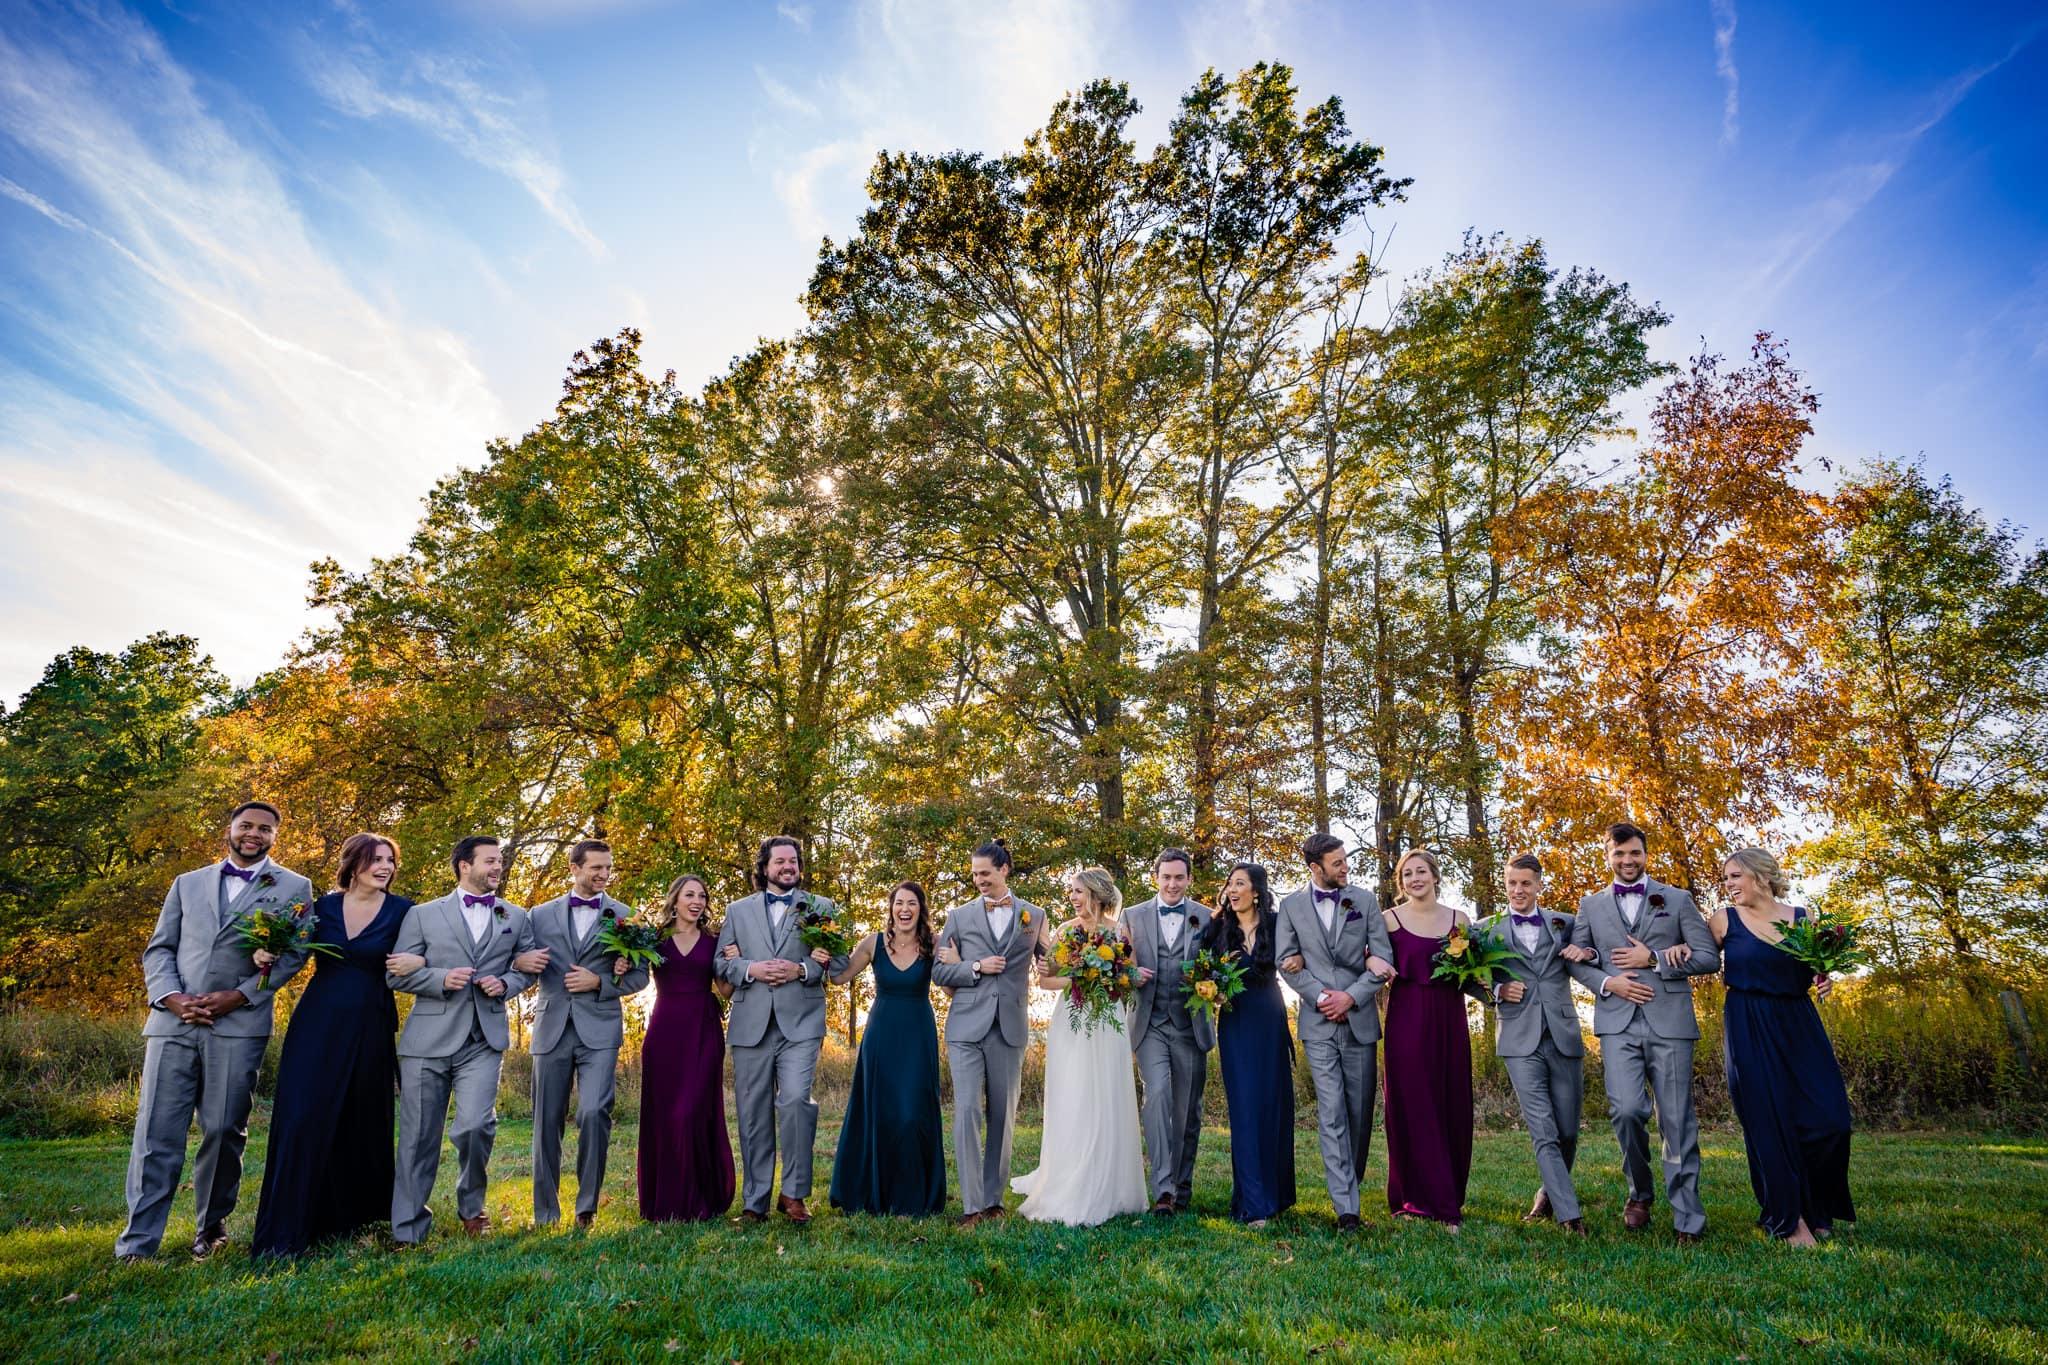 Wedding party locked arm in arm for fun wedding photo